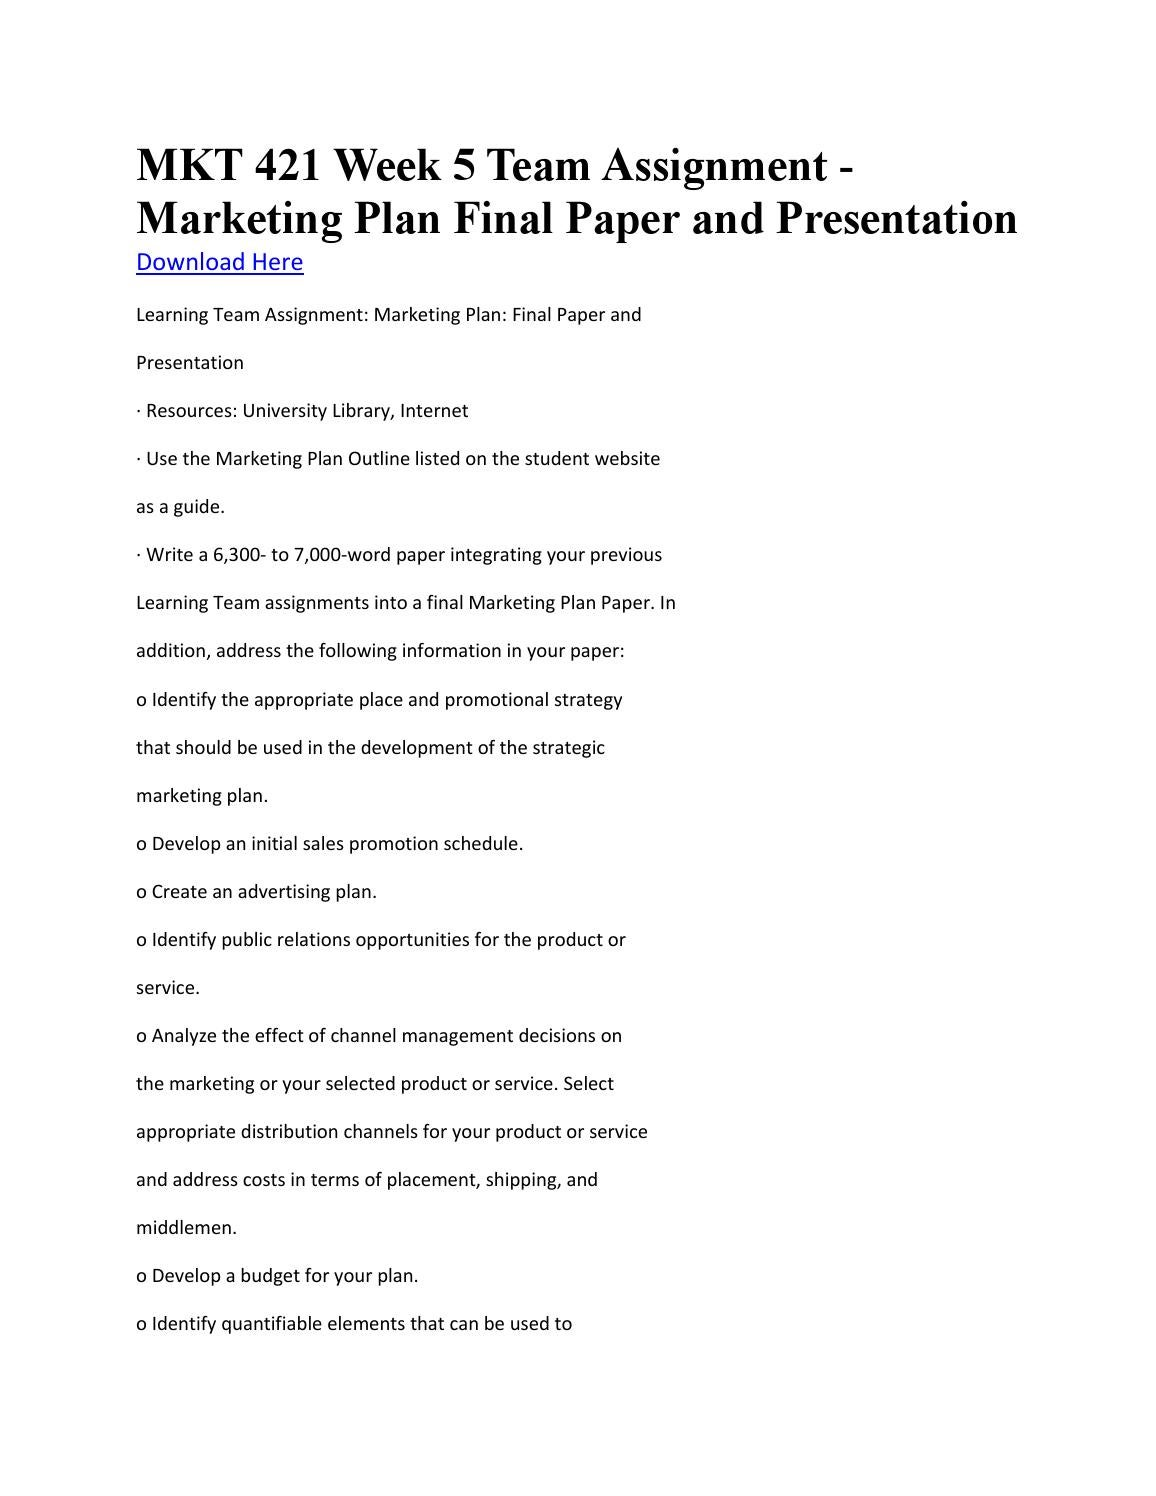 final week 6 team marketing plan View 3rd draft_marketing plan - final - week 6 - team dppt from mha 515 at university of phoenix marketing plan: final draft team d lolita davis, lucille impastato, nancy torres, thenta, tyeshia.